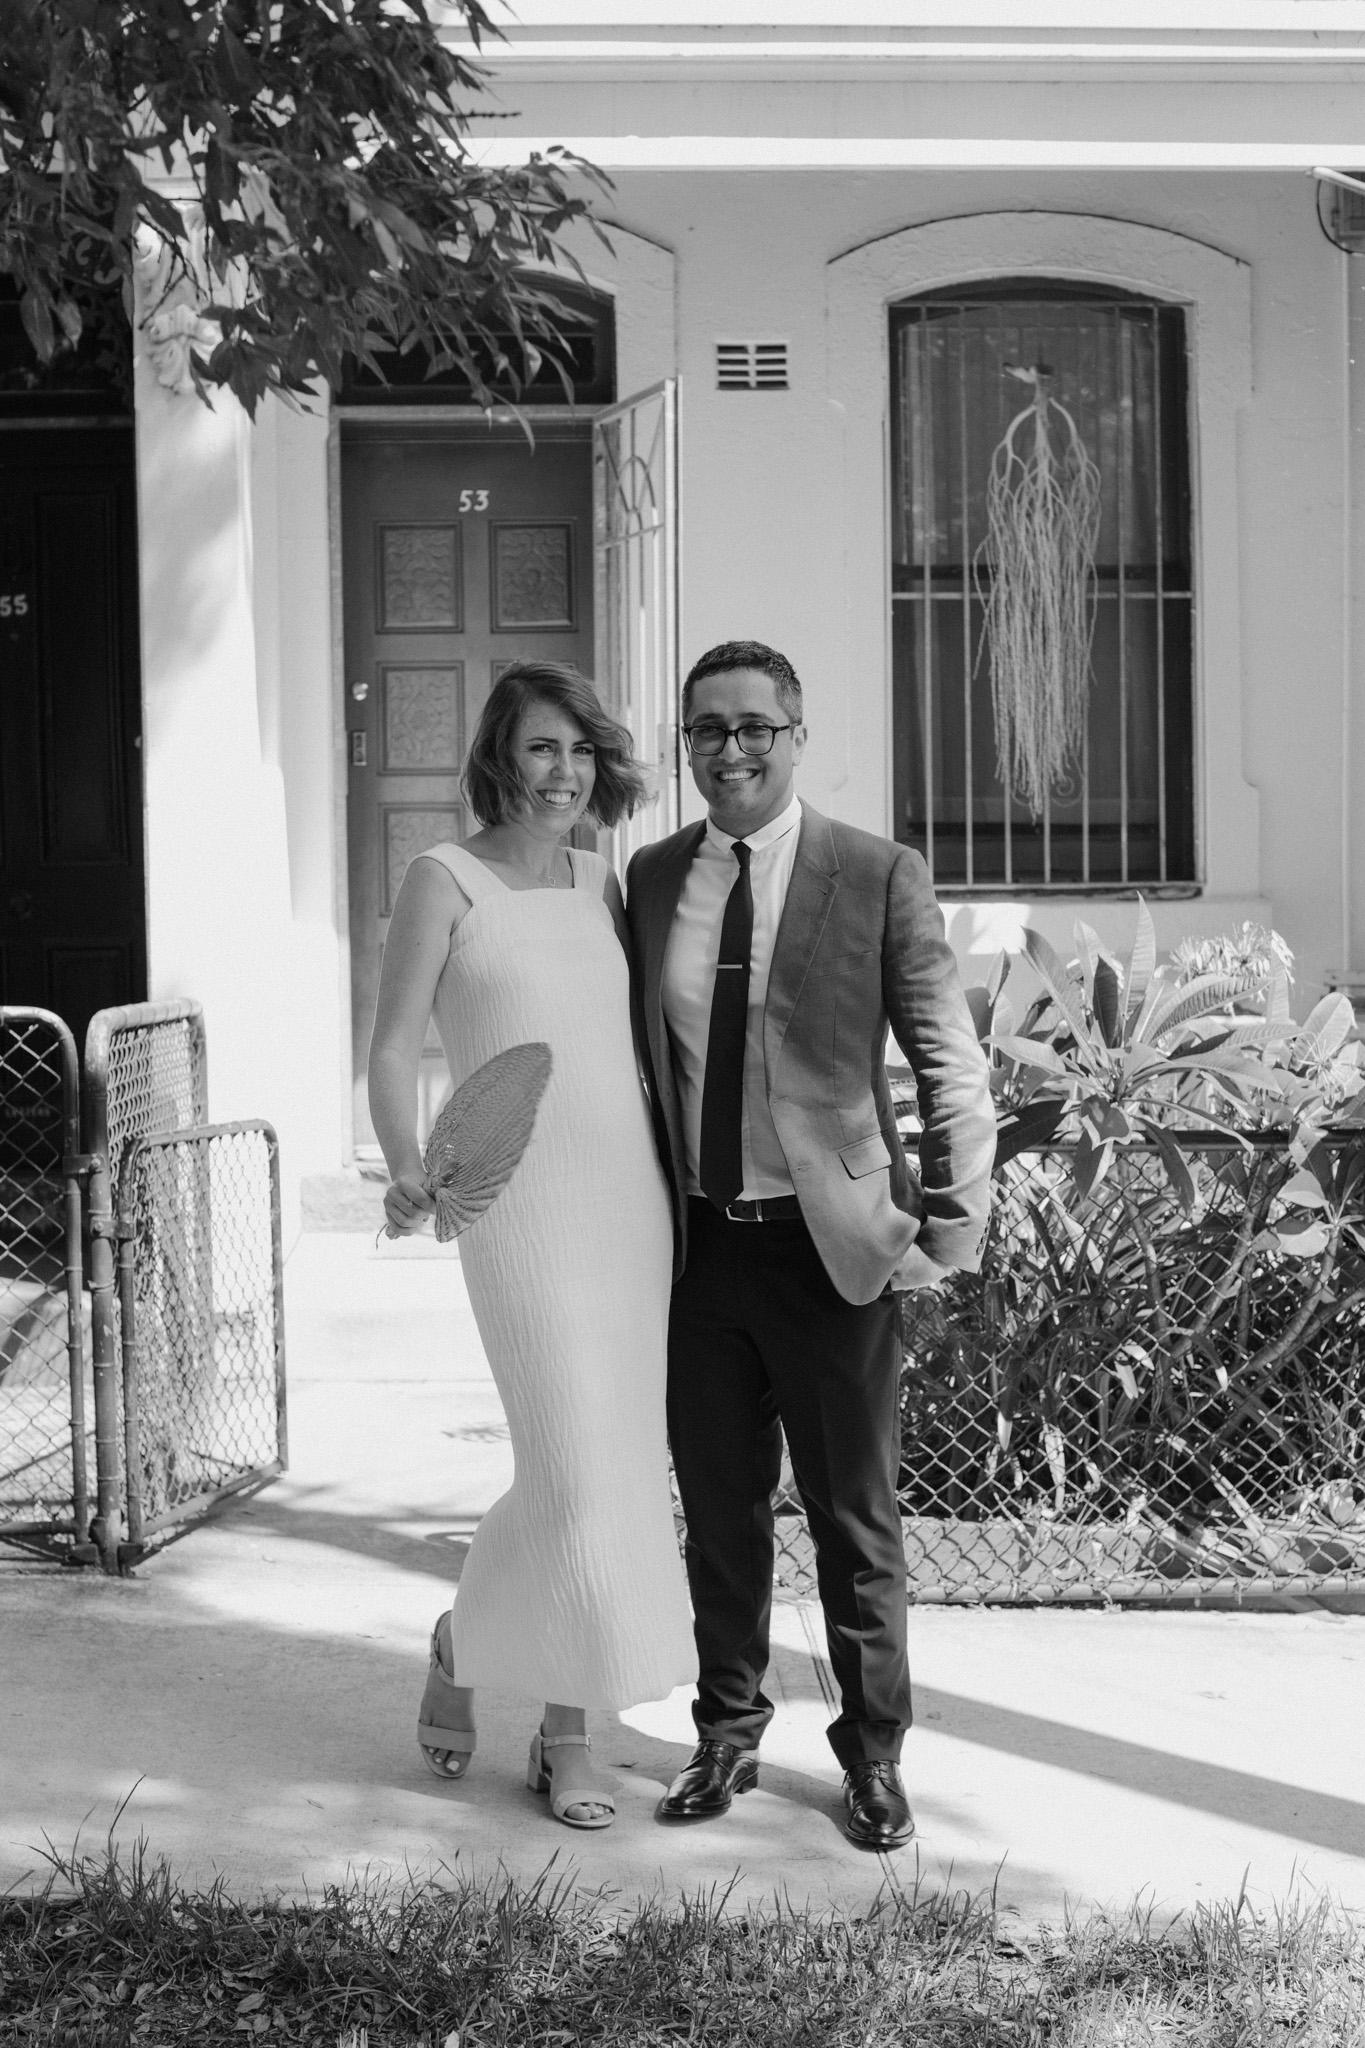 Cass&Majid_2017_credit_JacquieManning24.jpg